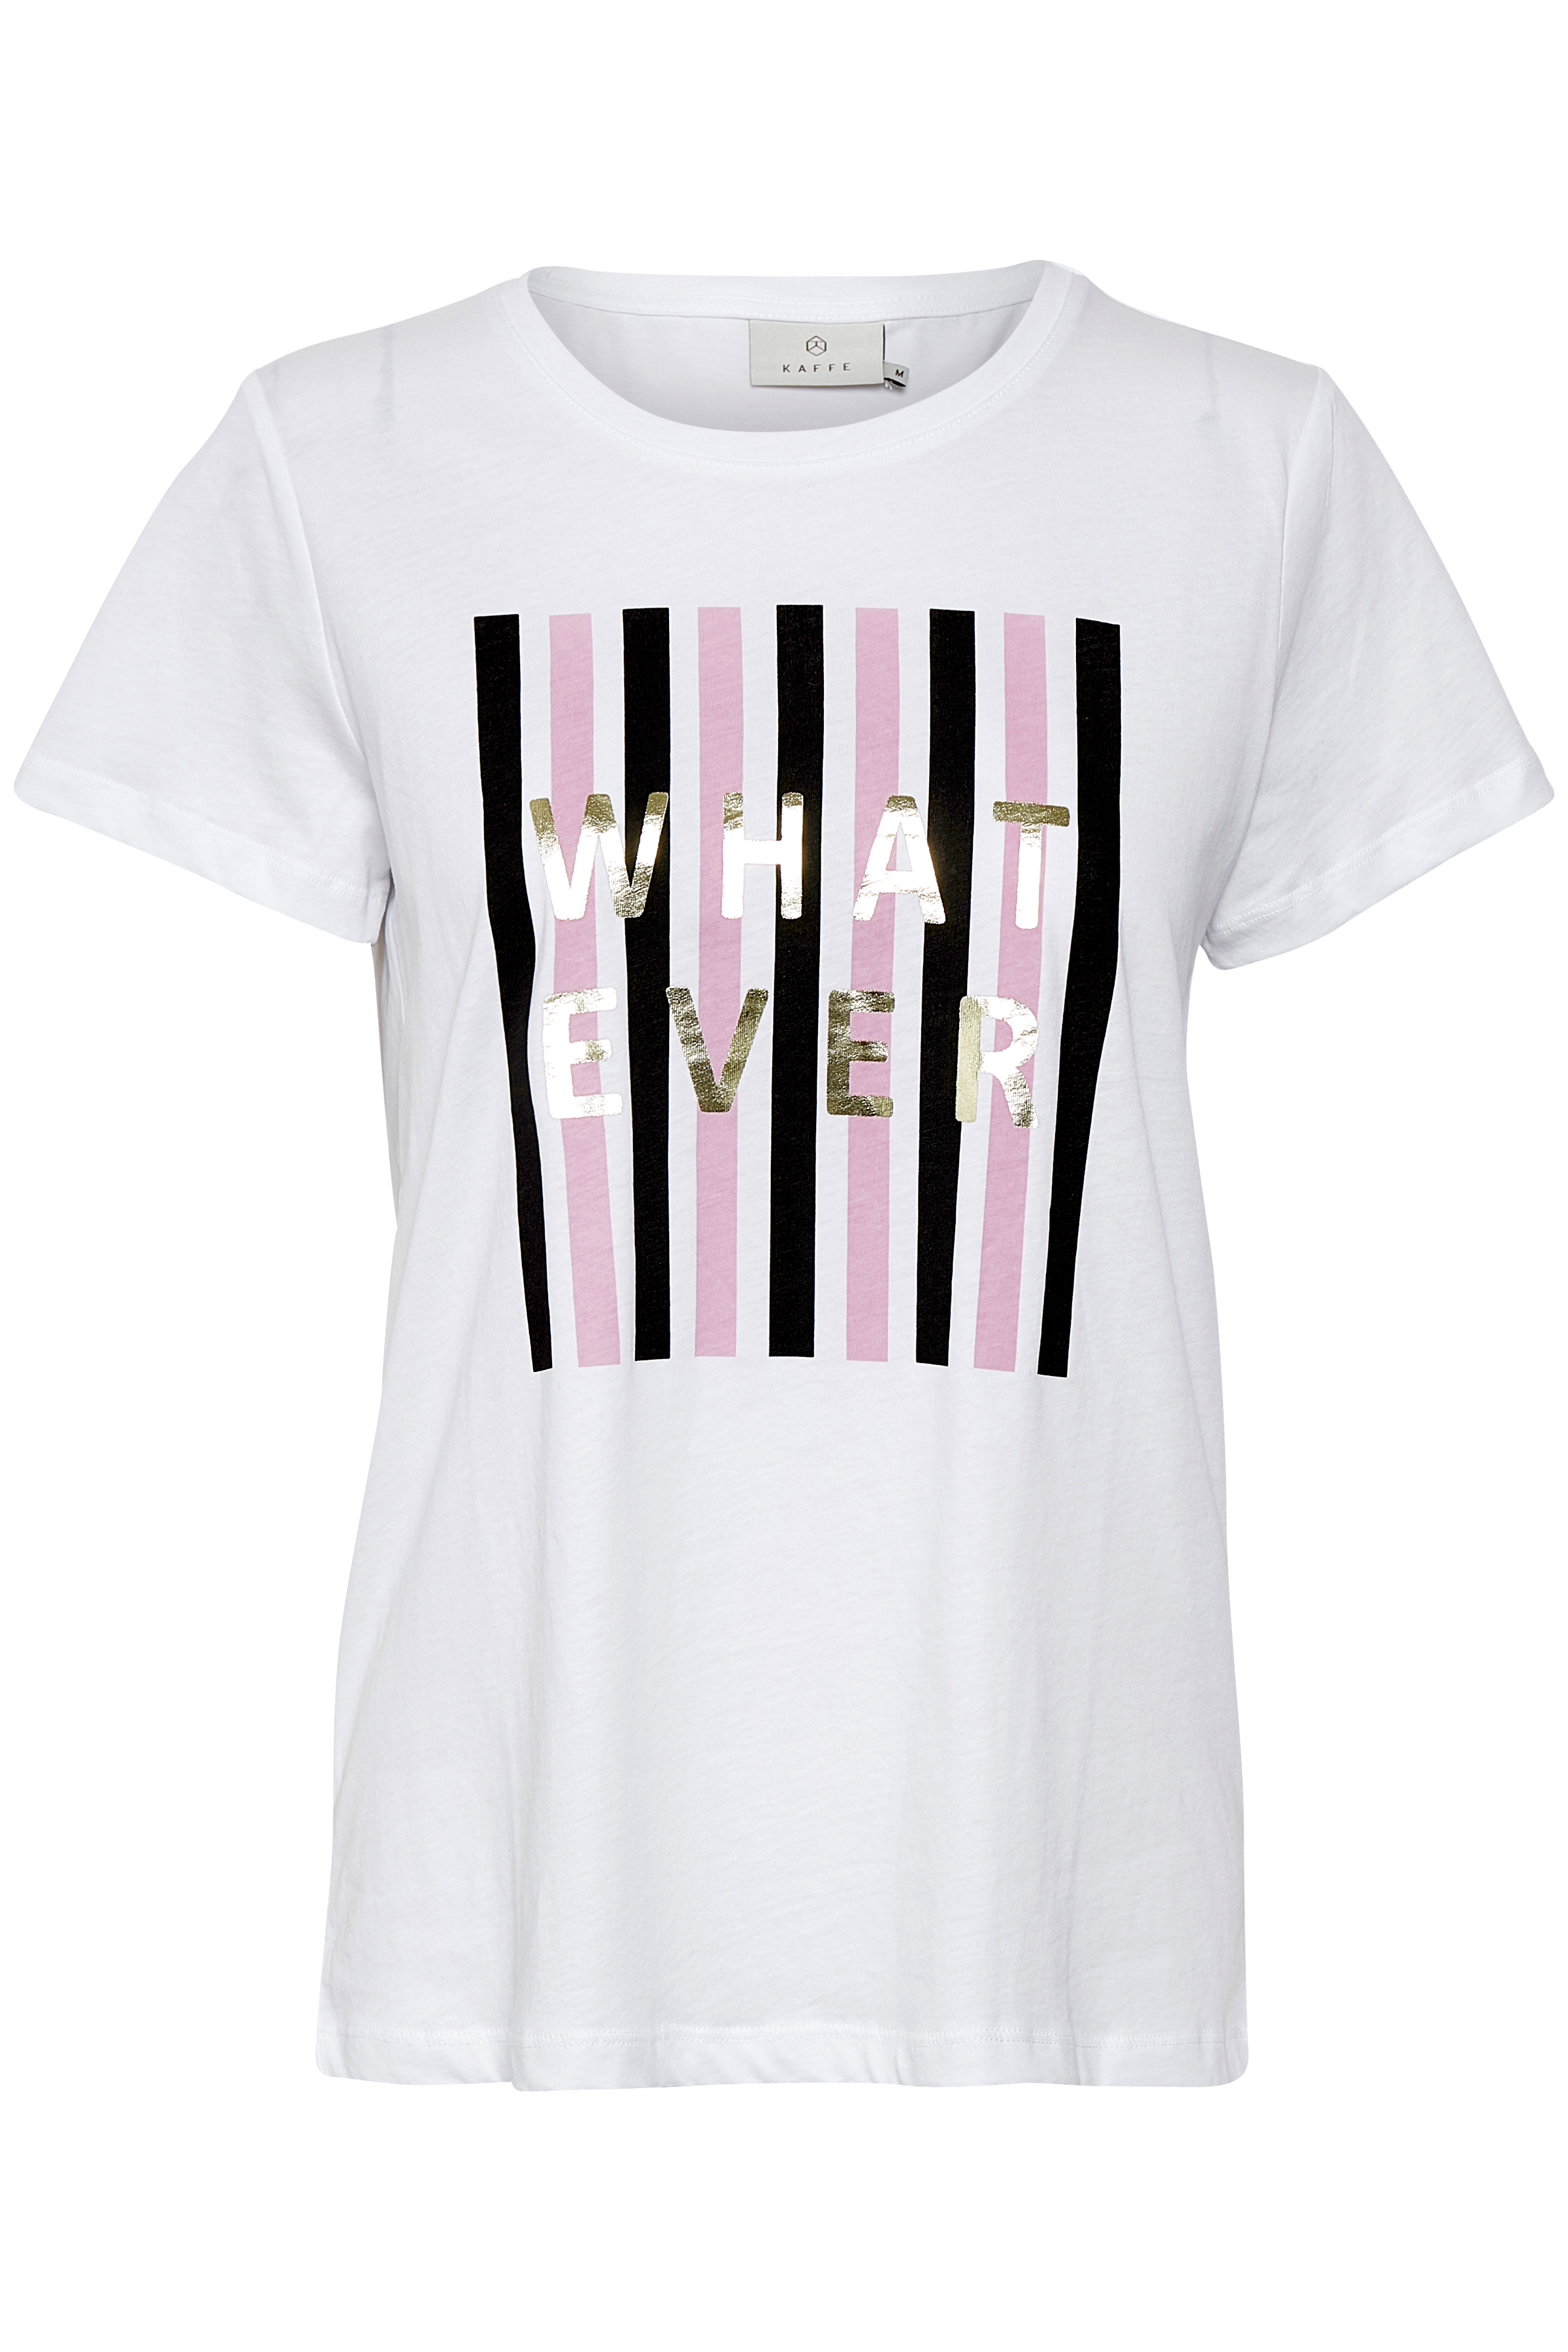 Kaffe Dame T-shirt  - Hvid/pink